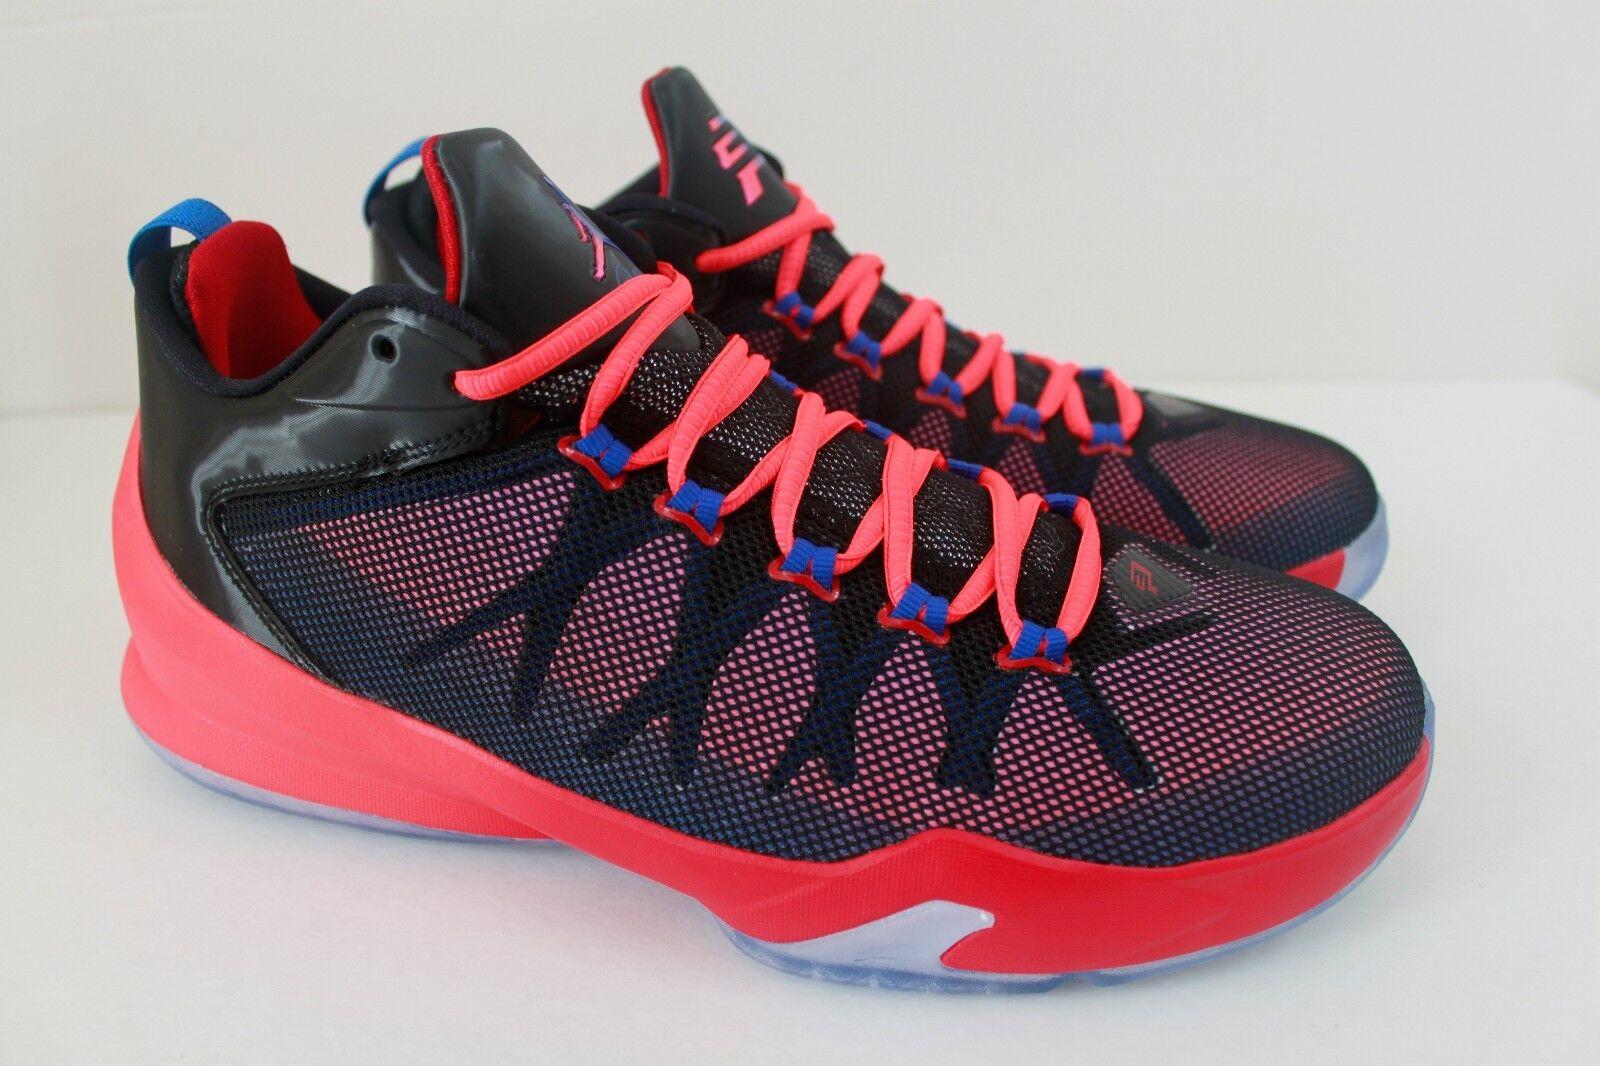 Nike - mens 725173 025 schwarze royal ROT basketballsneaker schuh 10,5 m nib